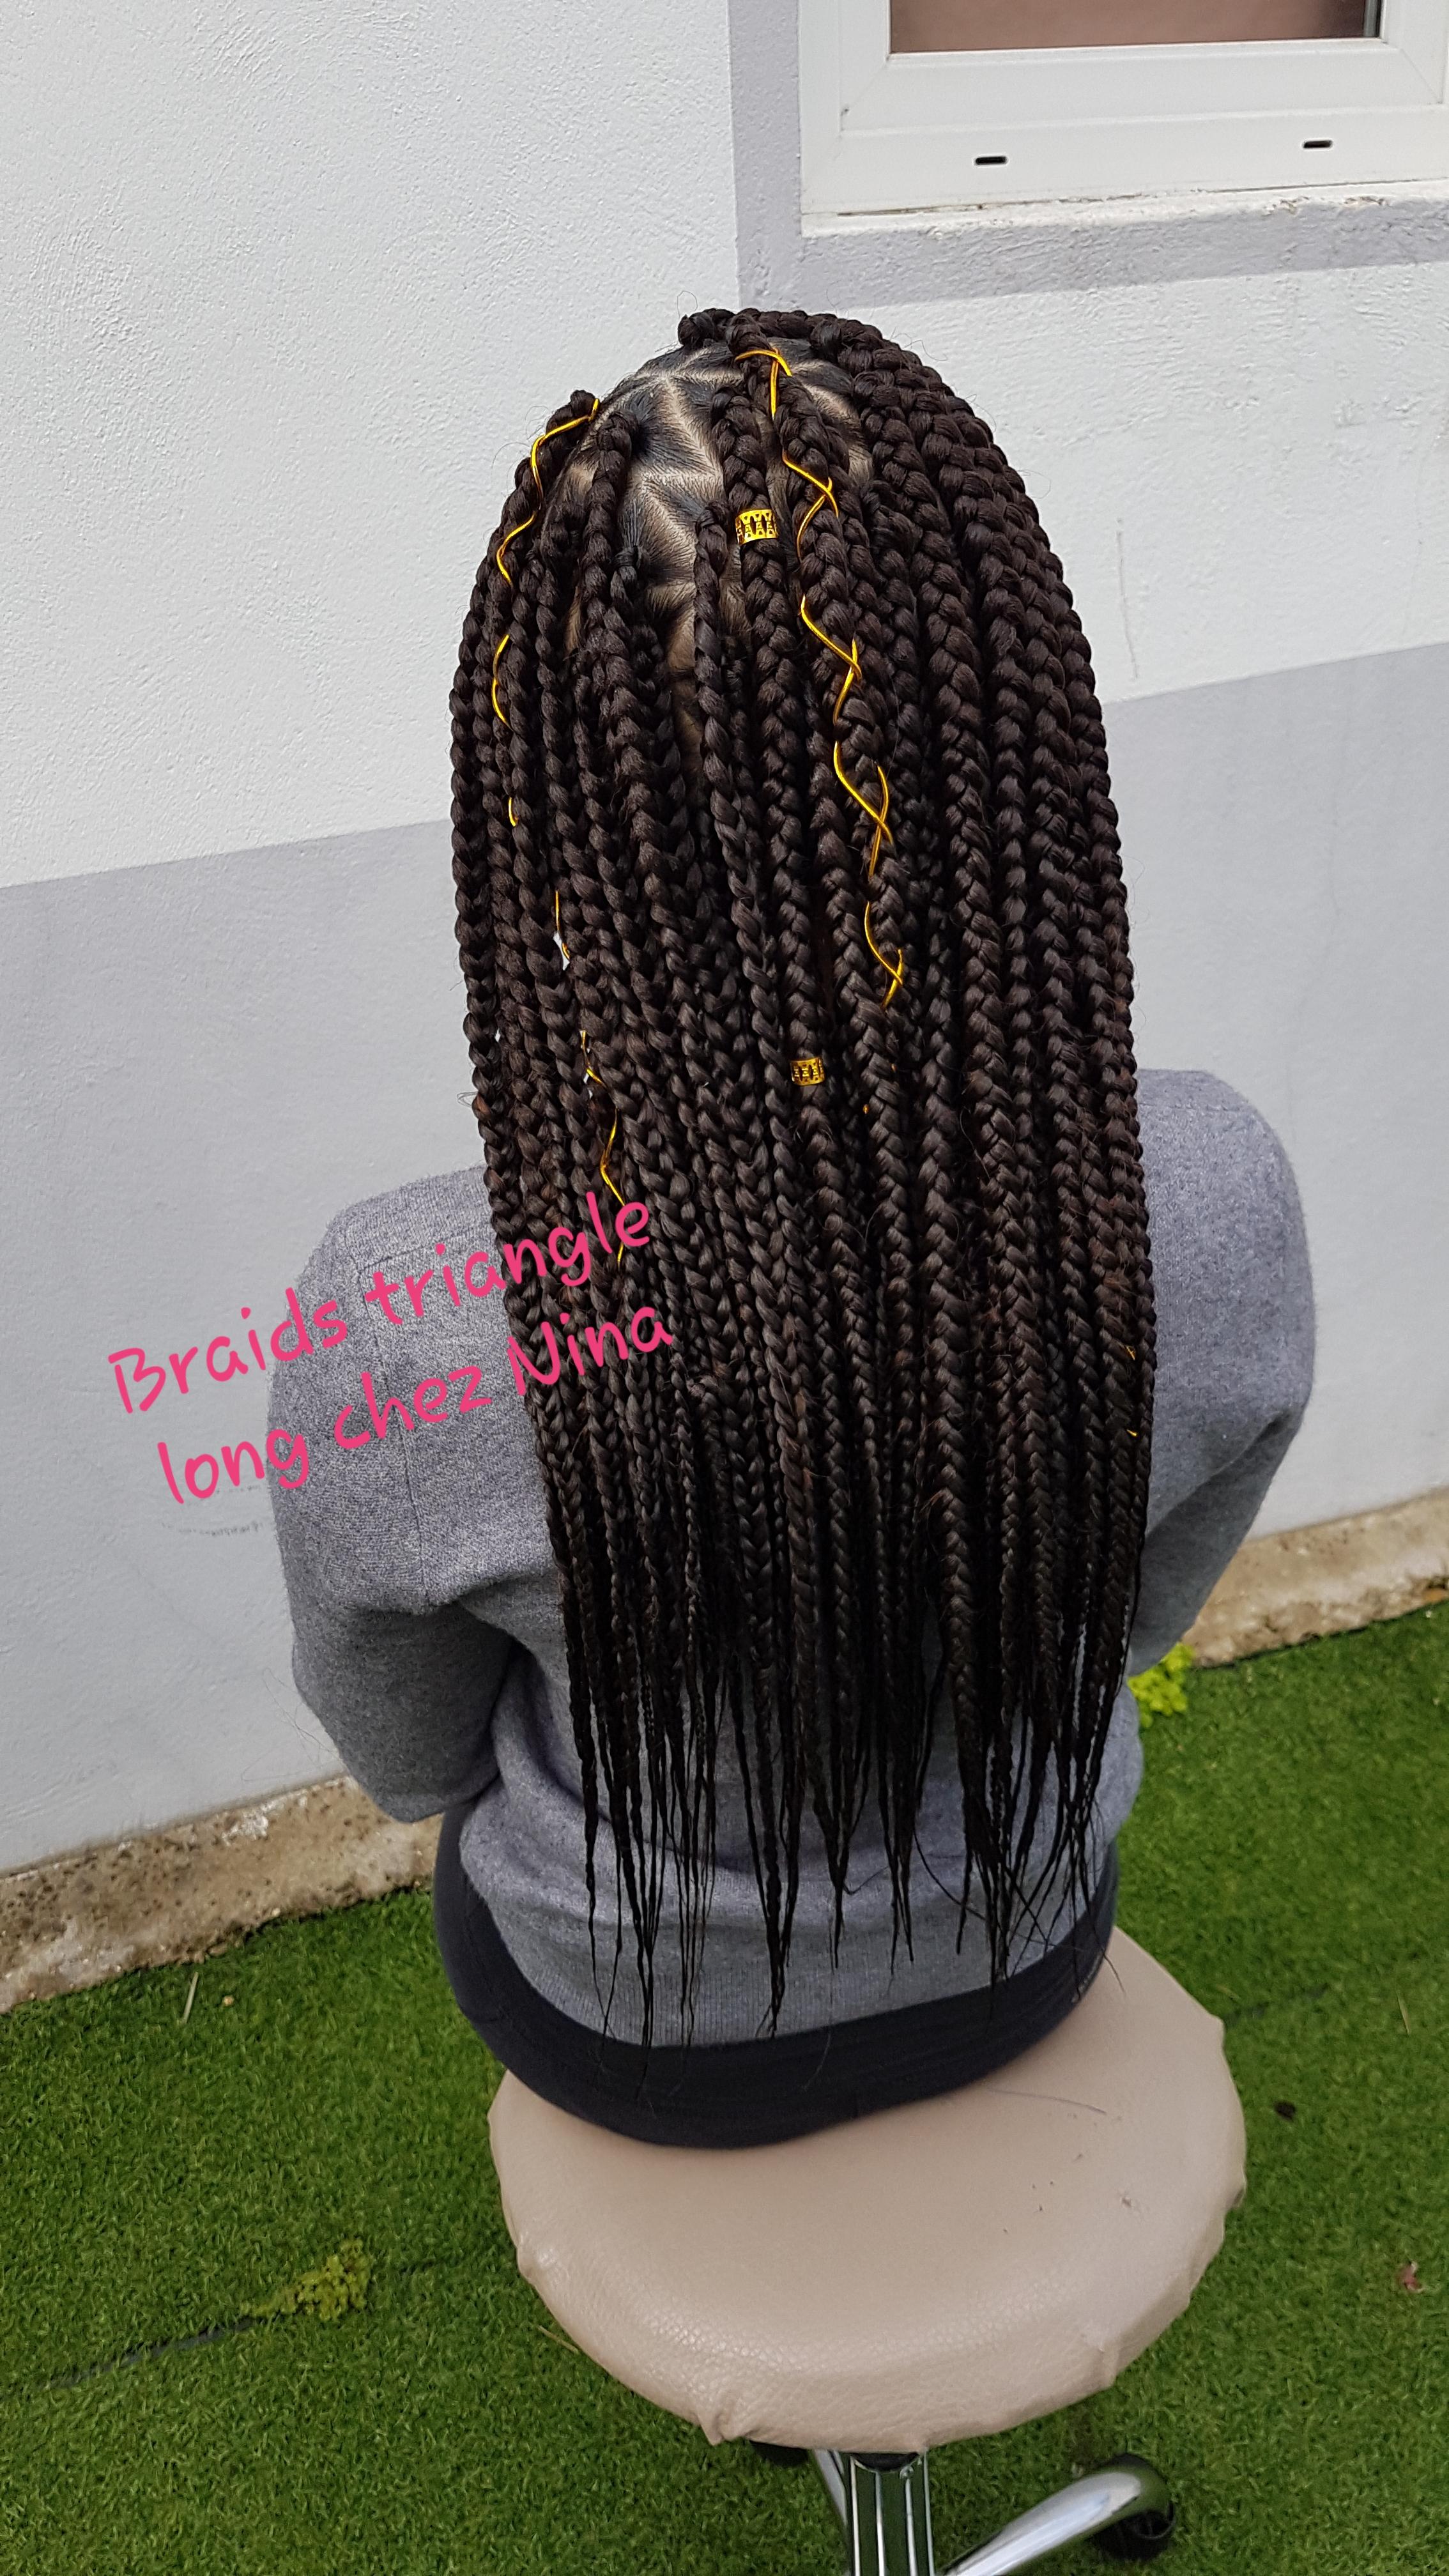 salon de coiffure afro tresse tresses box braids crochet braids vanilles tissages paris 75 77 78 91 92 93 94 95 PDKJTEPU